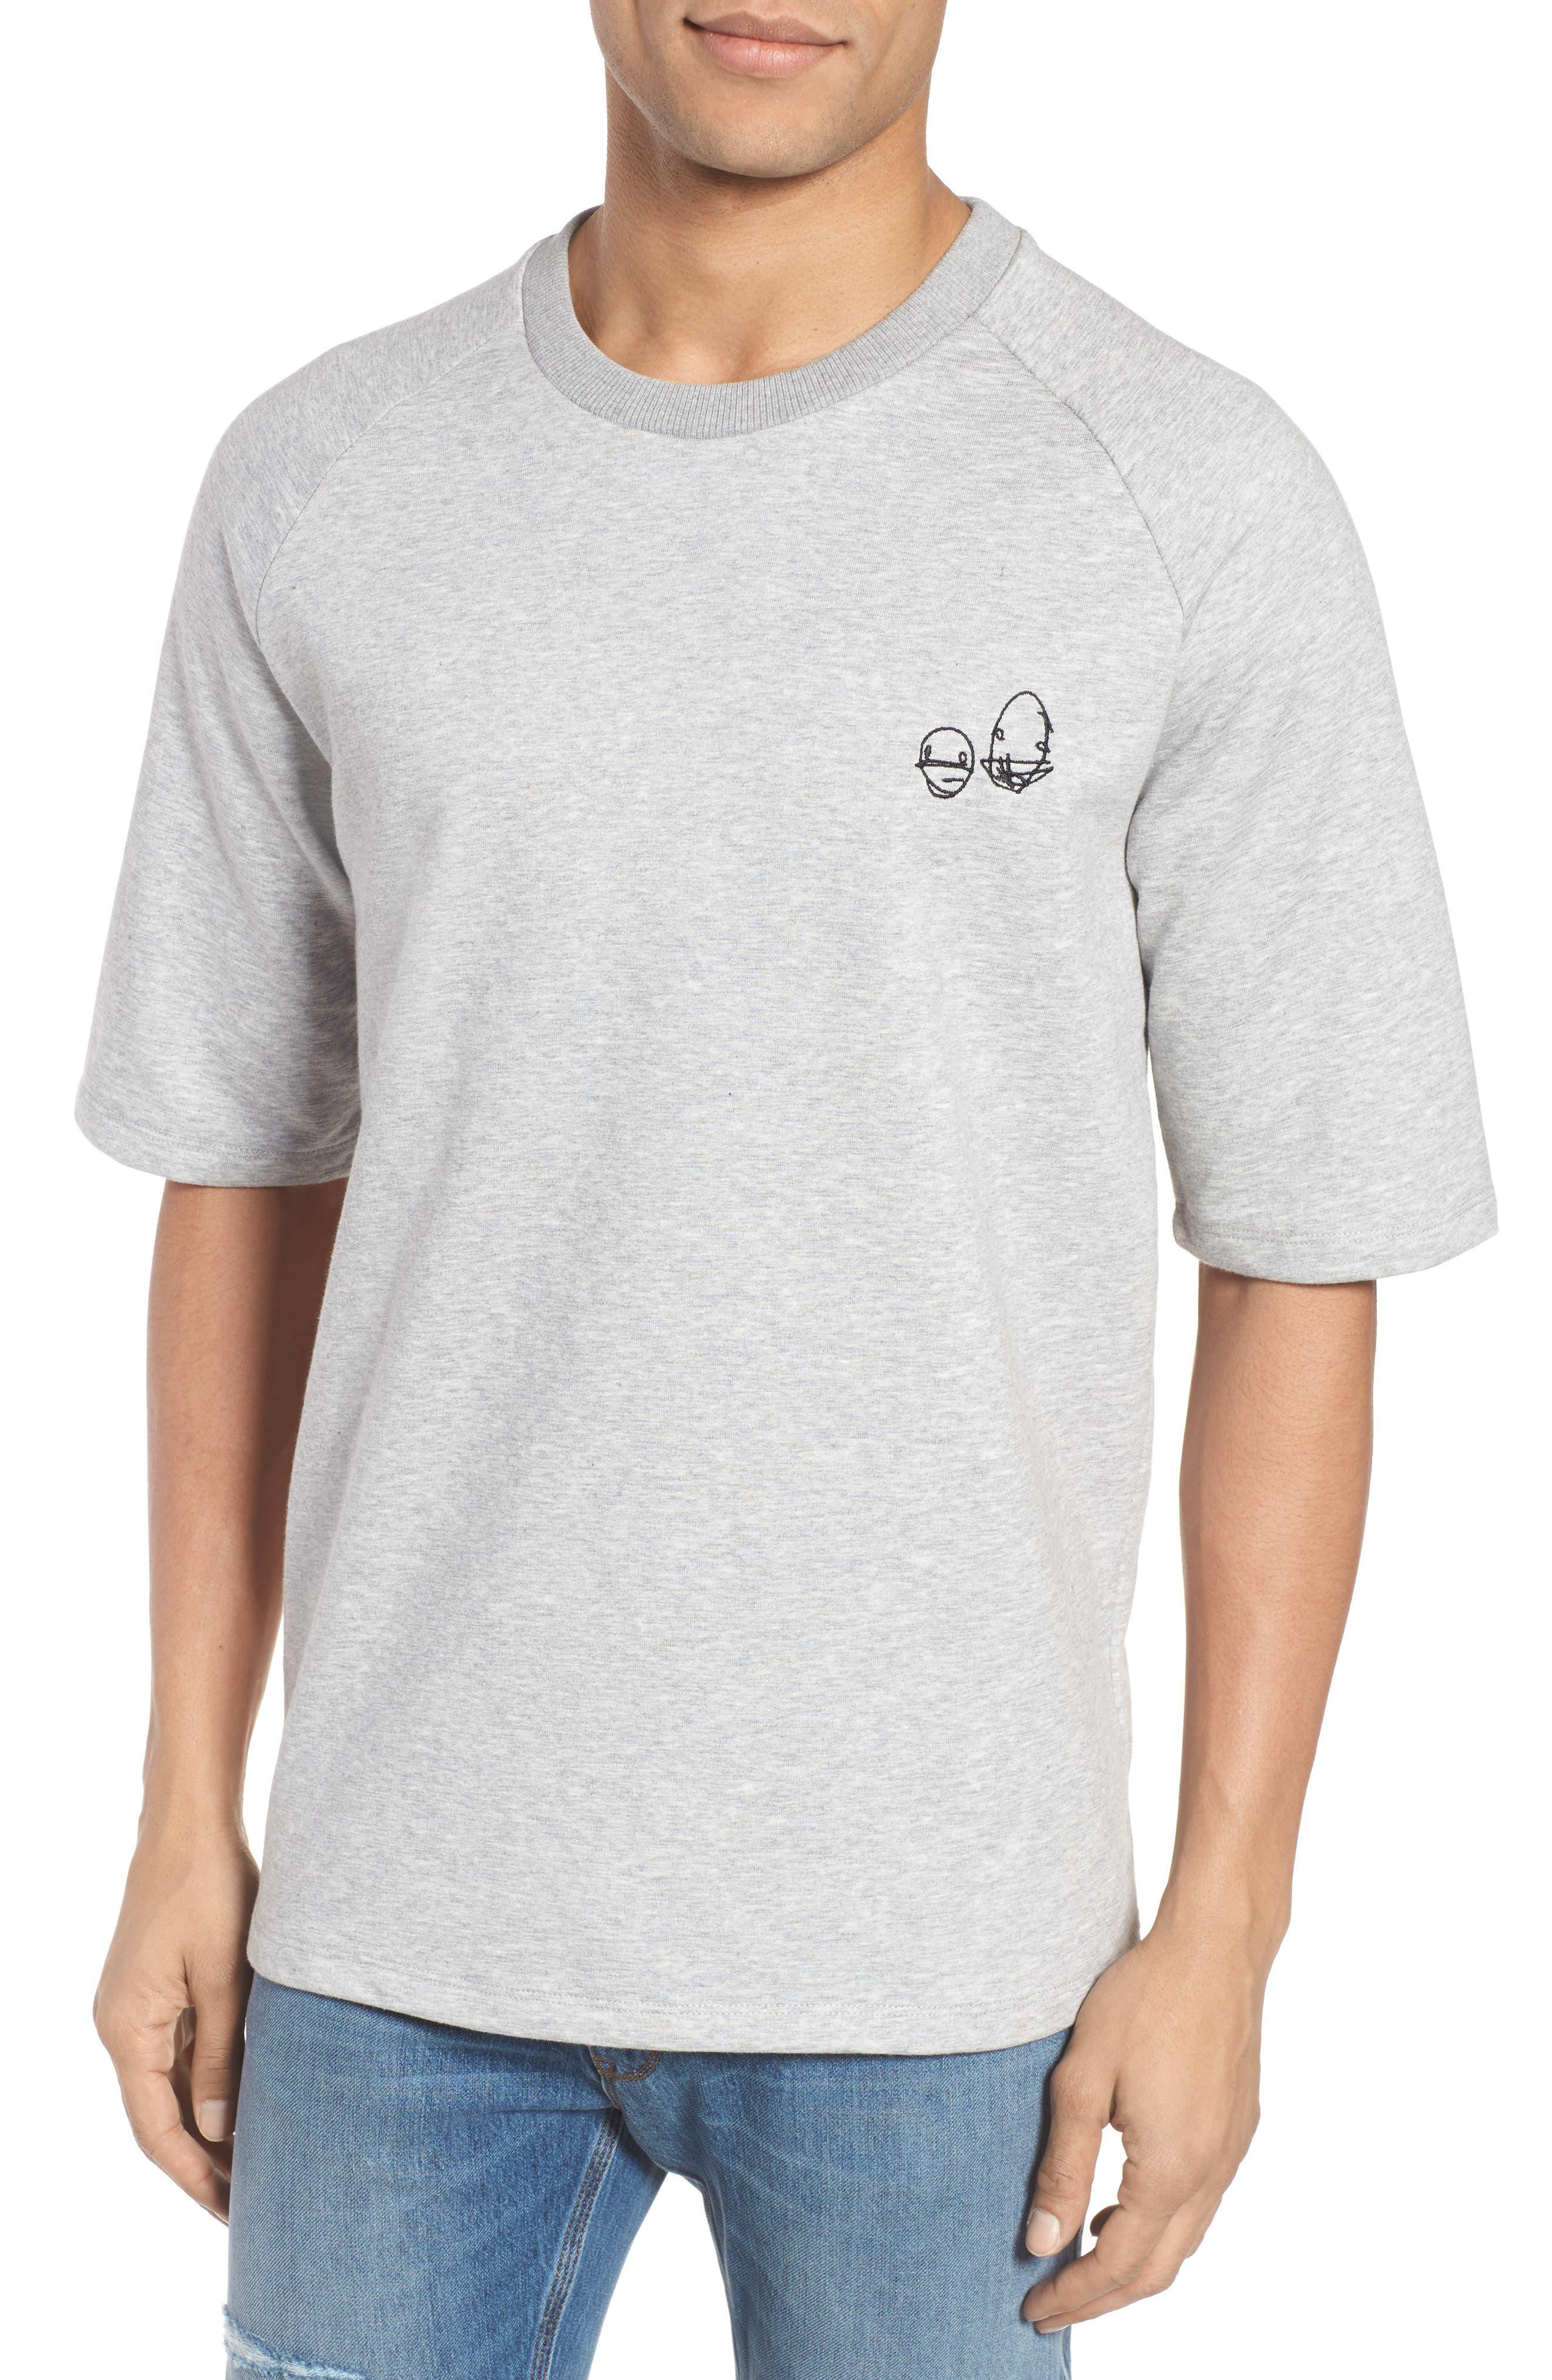 Deast Doodle Sweatshirt,                         Main,                         color, Grey